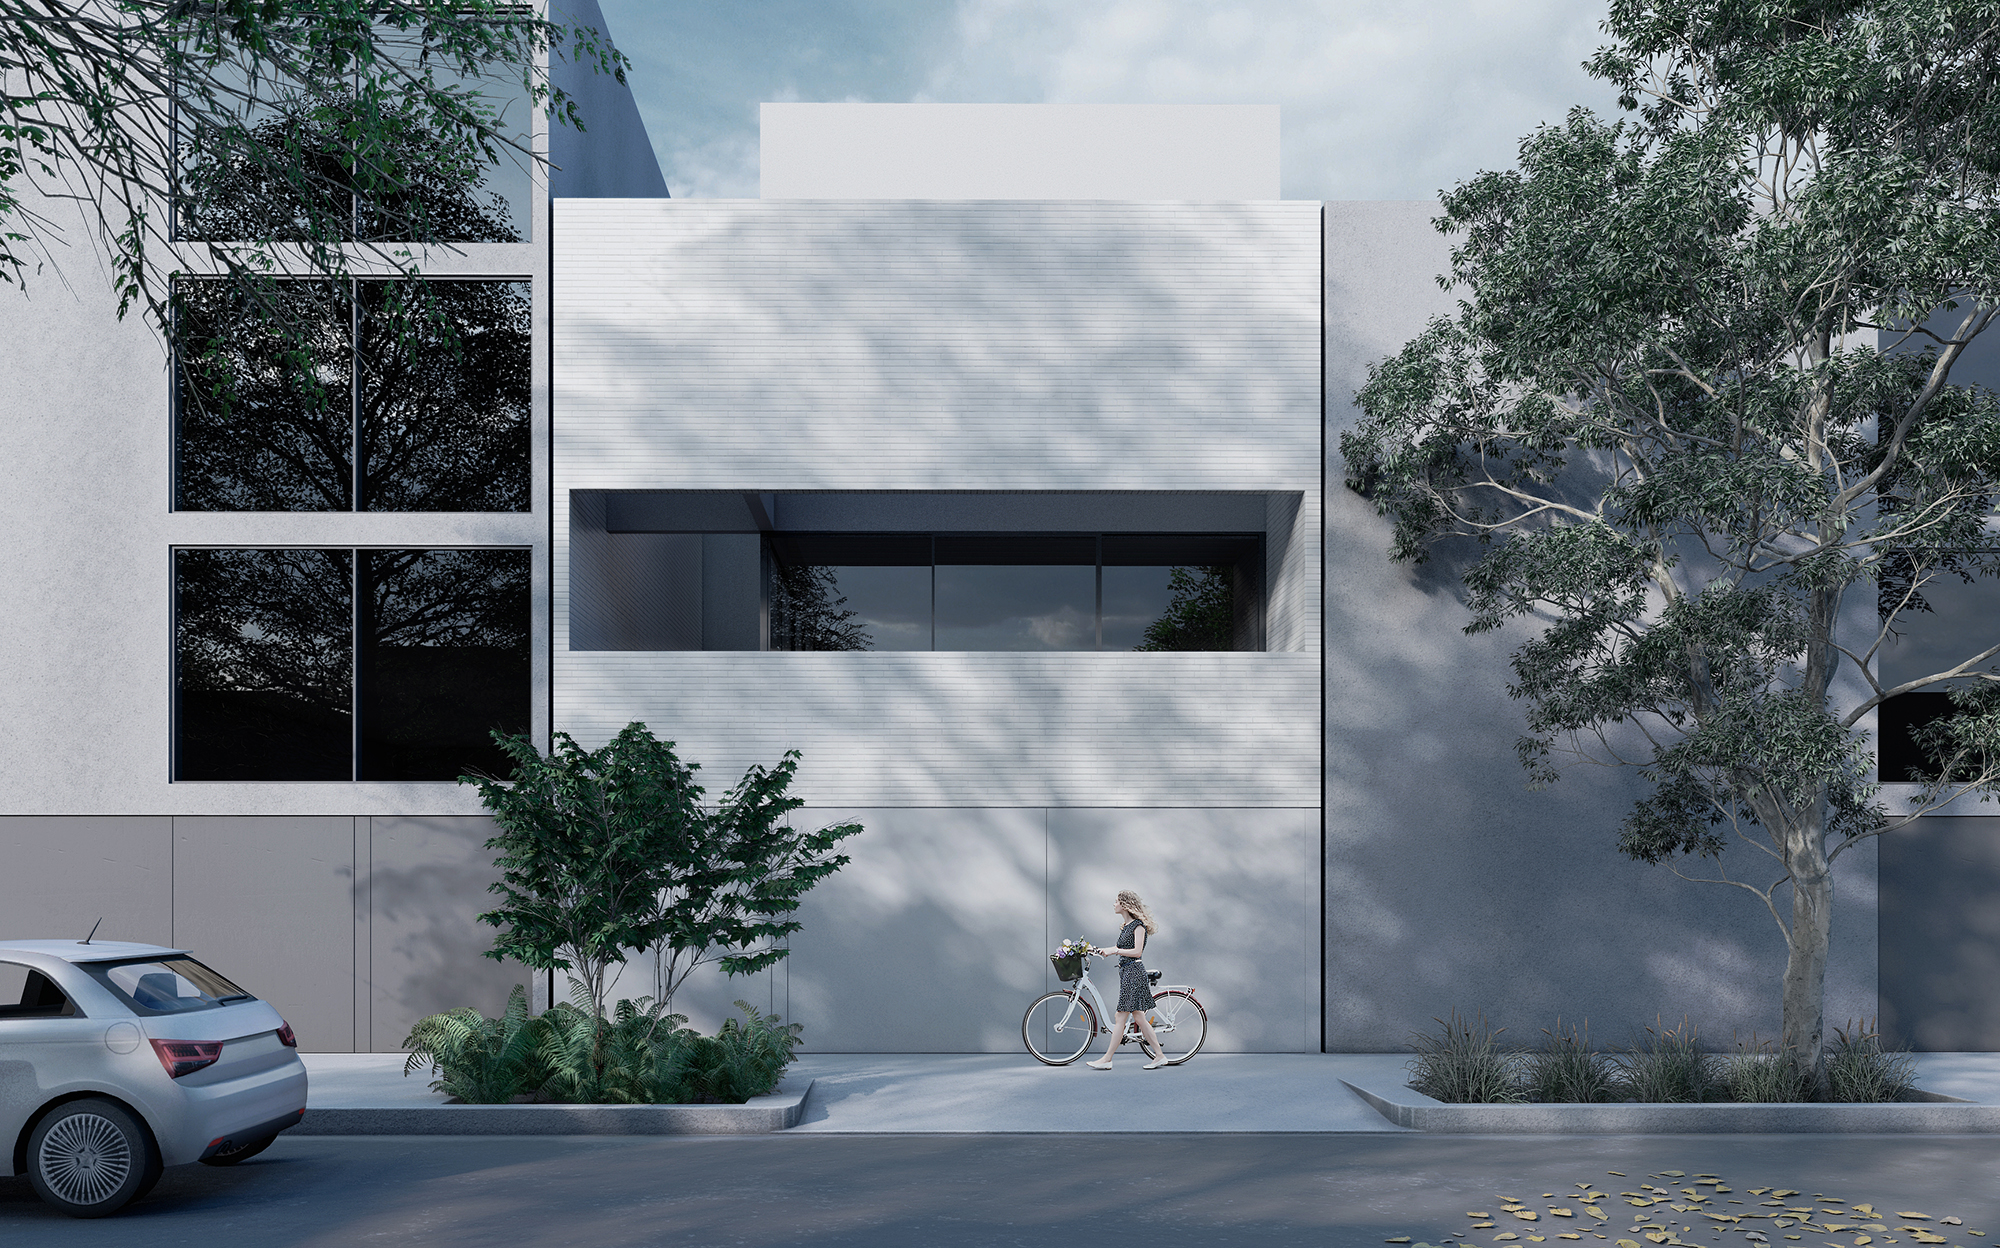 Casas Siamesas - 05